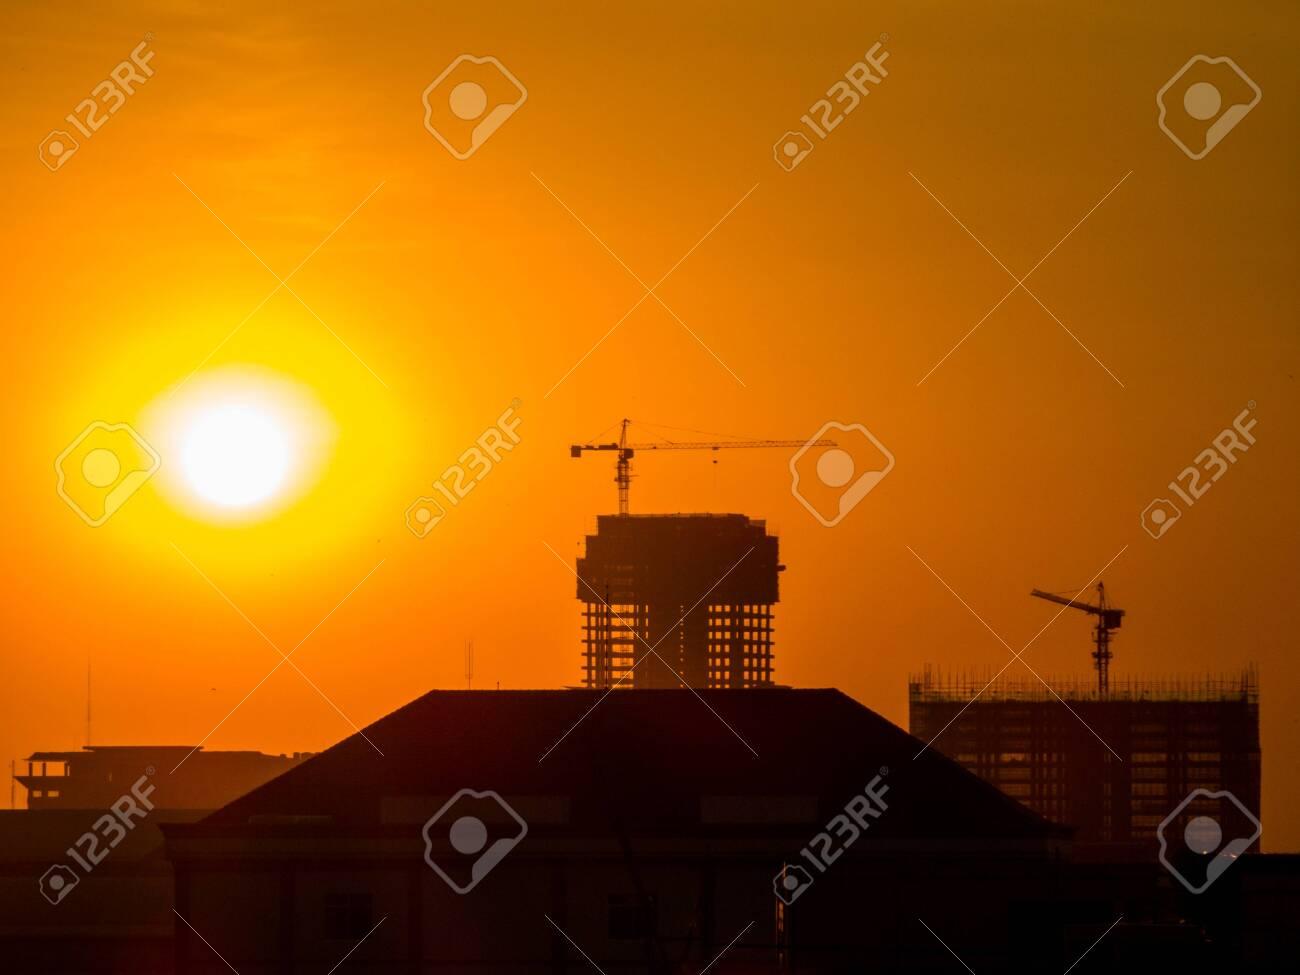 Construction cranes at sunset. In Phnom Penh, Cambodia - 151513378